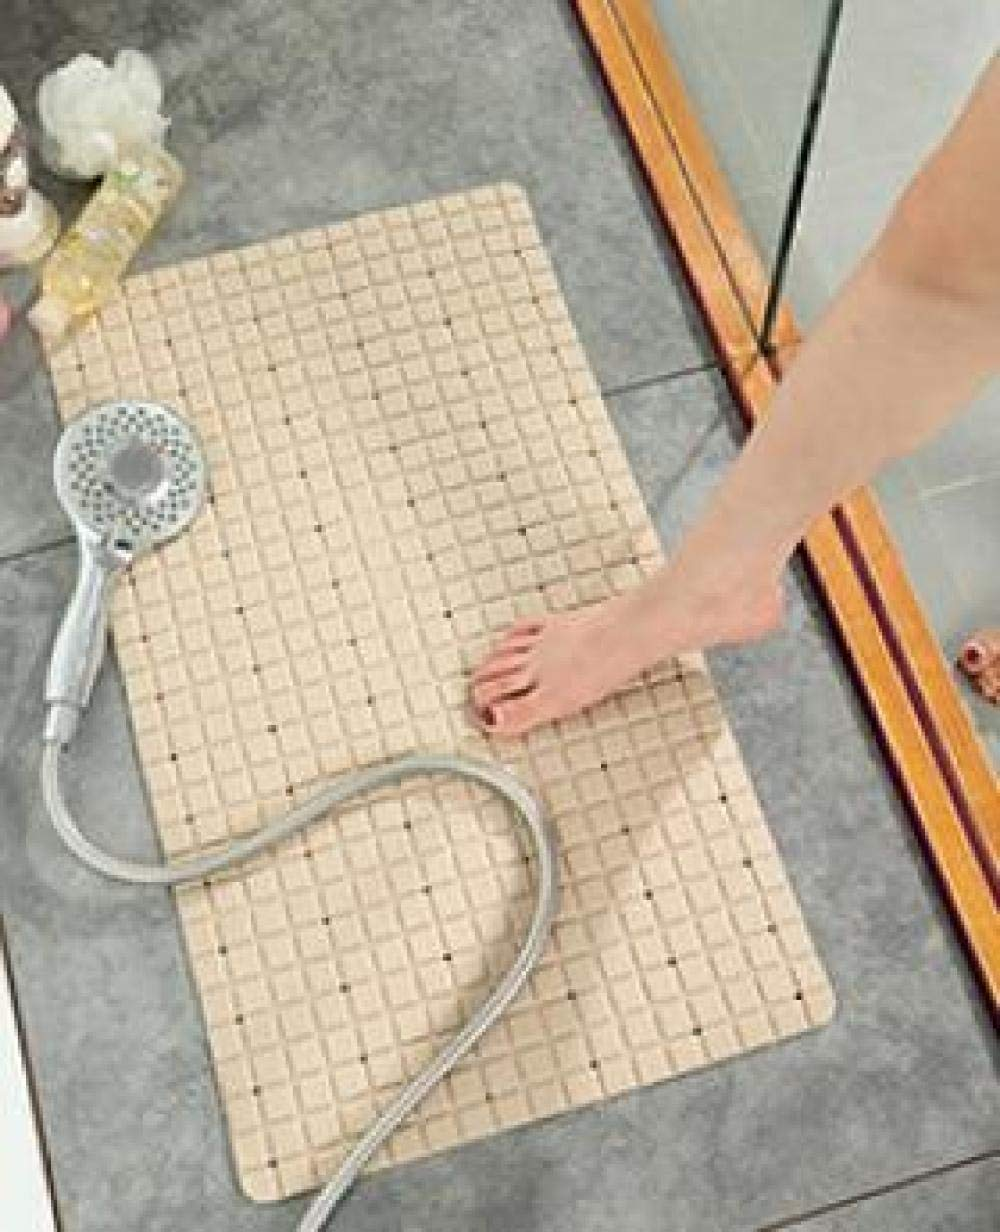 WOSBE Duschmatte rutschfest quadratisch modern Rechteckige quadratische erh/öhte PVC-Badezimmer-Saugnapfmatte 40 71cm beige